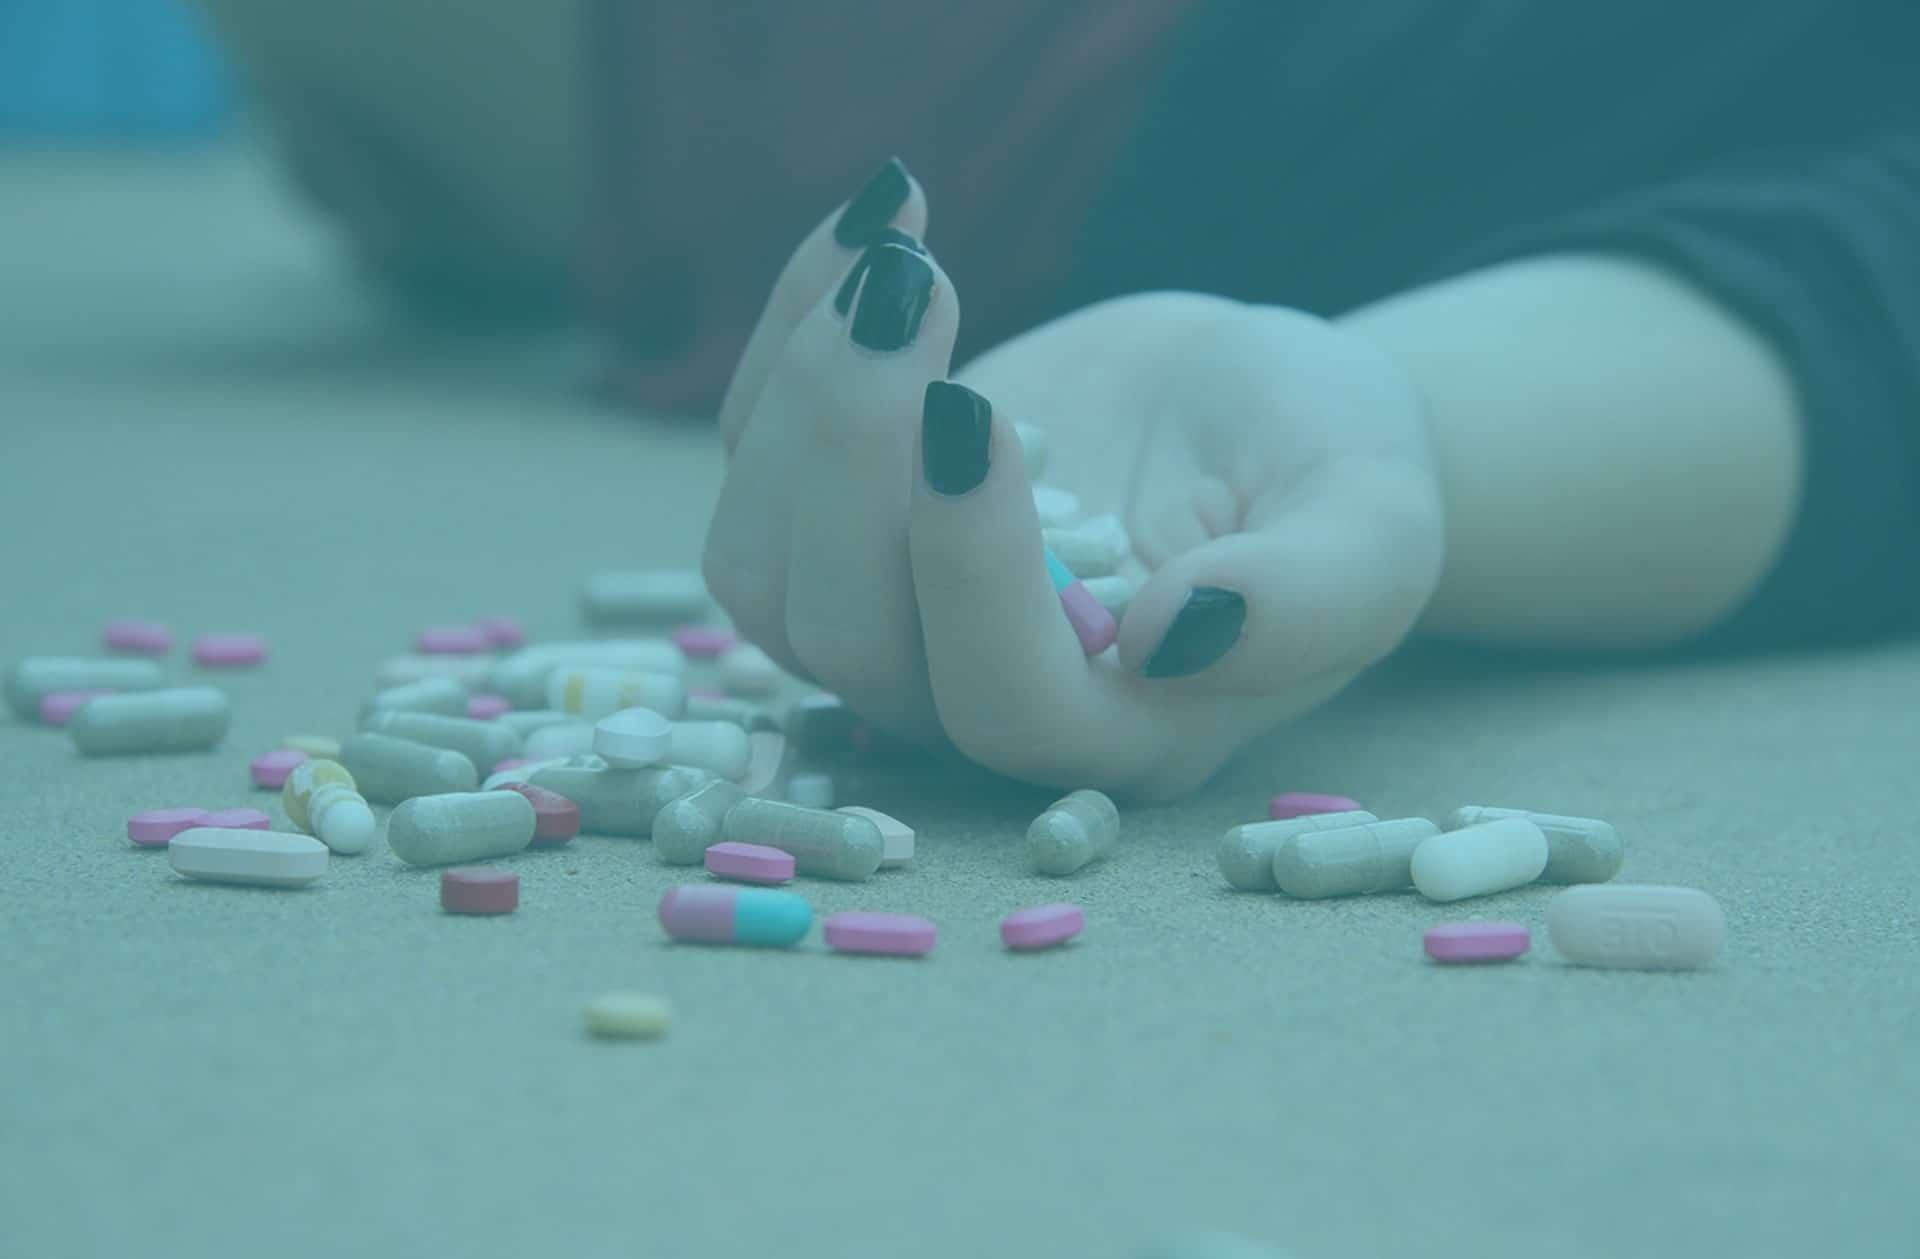 crack cocaine drugs